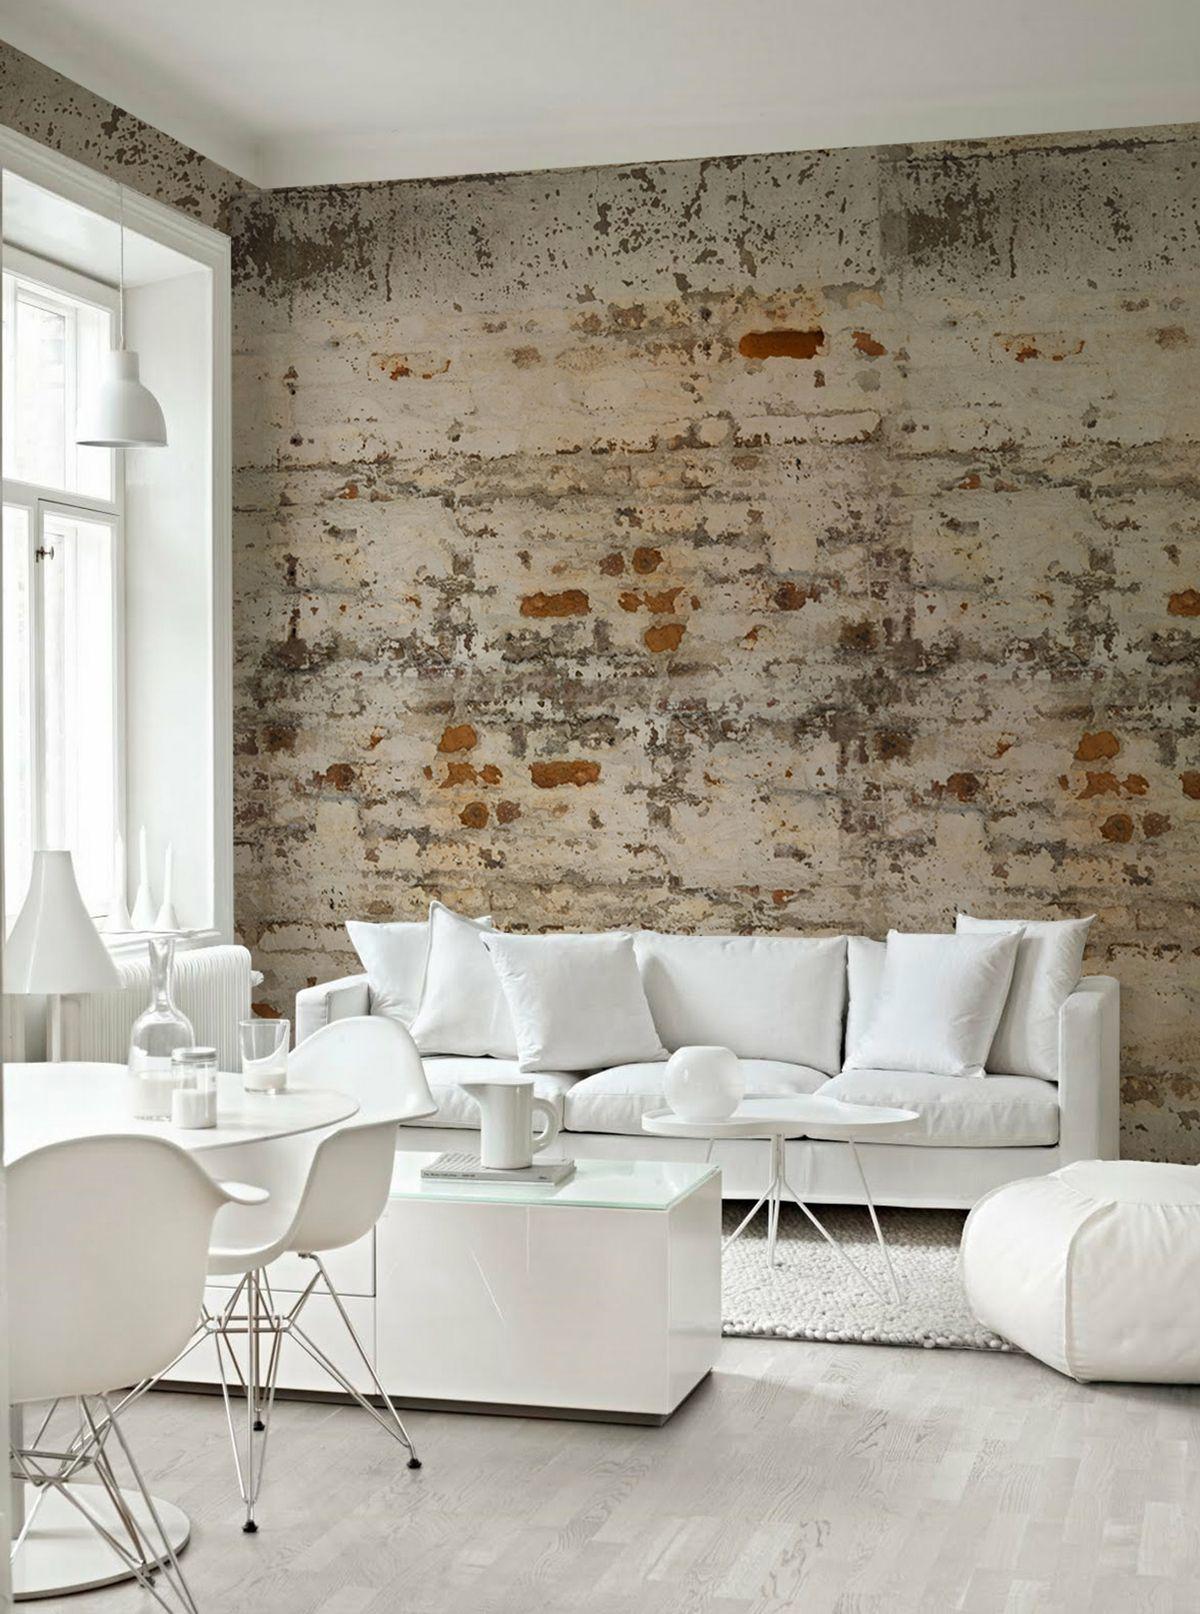 Natur Wand #Hausbau | Bauforum-Hausbau | Pinterest | Backstein ...